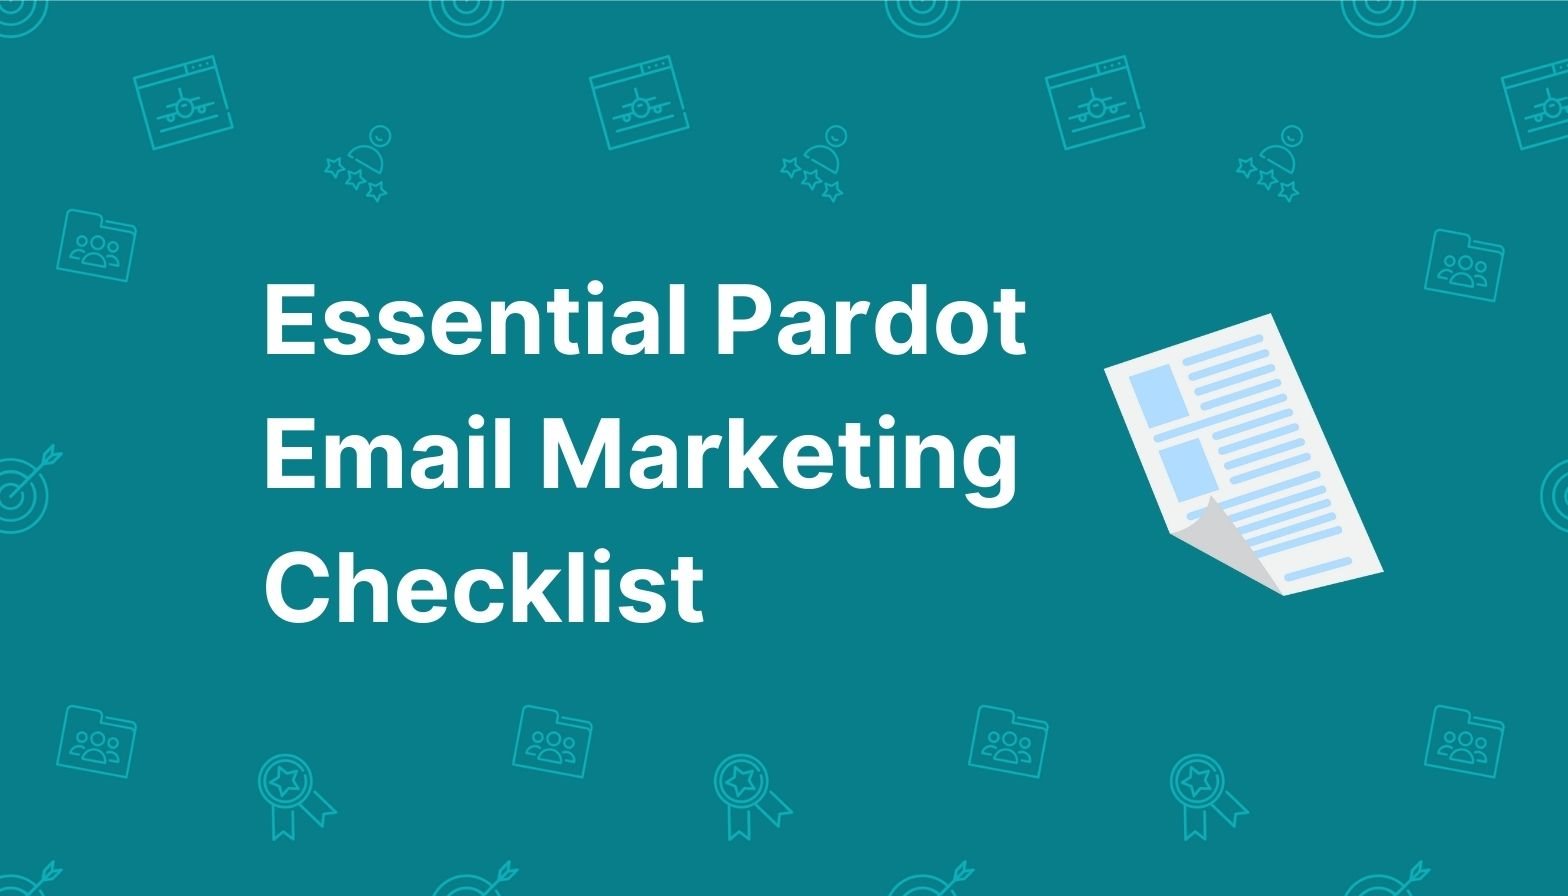 Feature image: Essential Pardot email marketing checklist